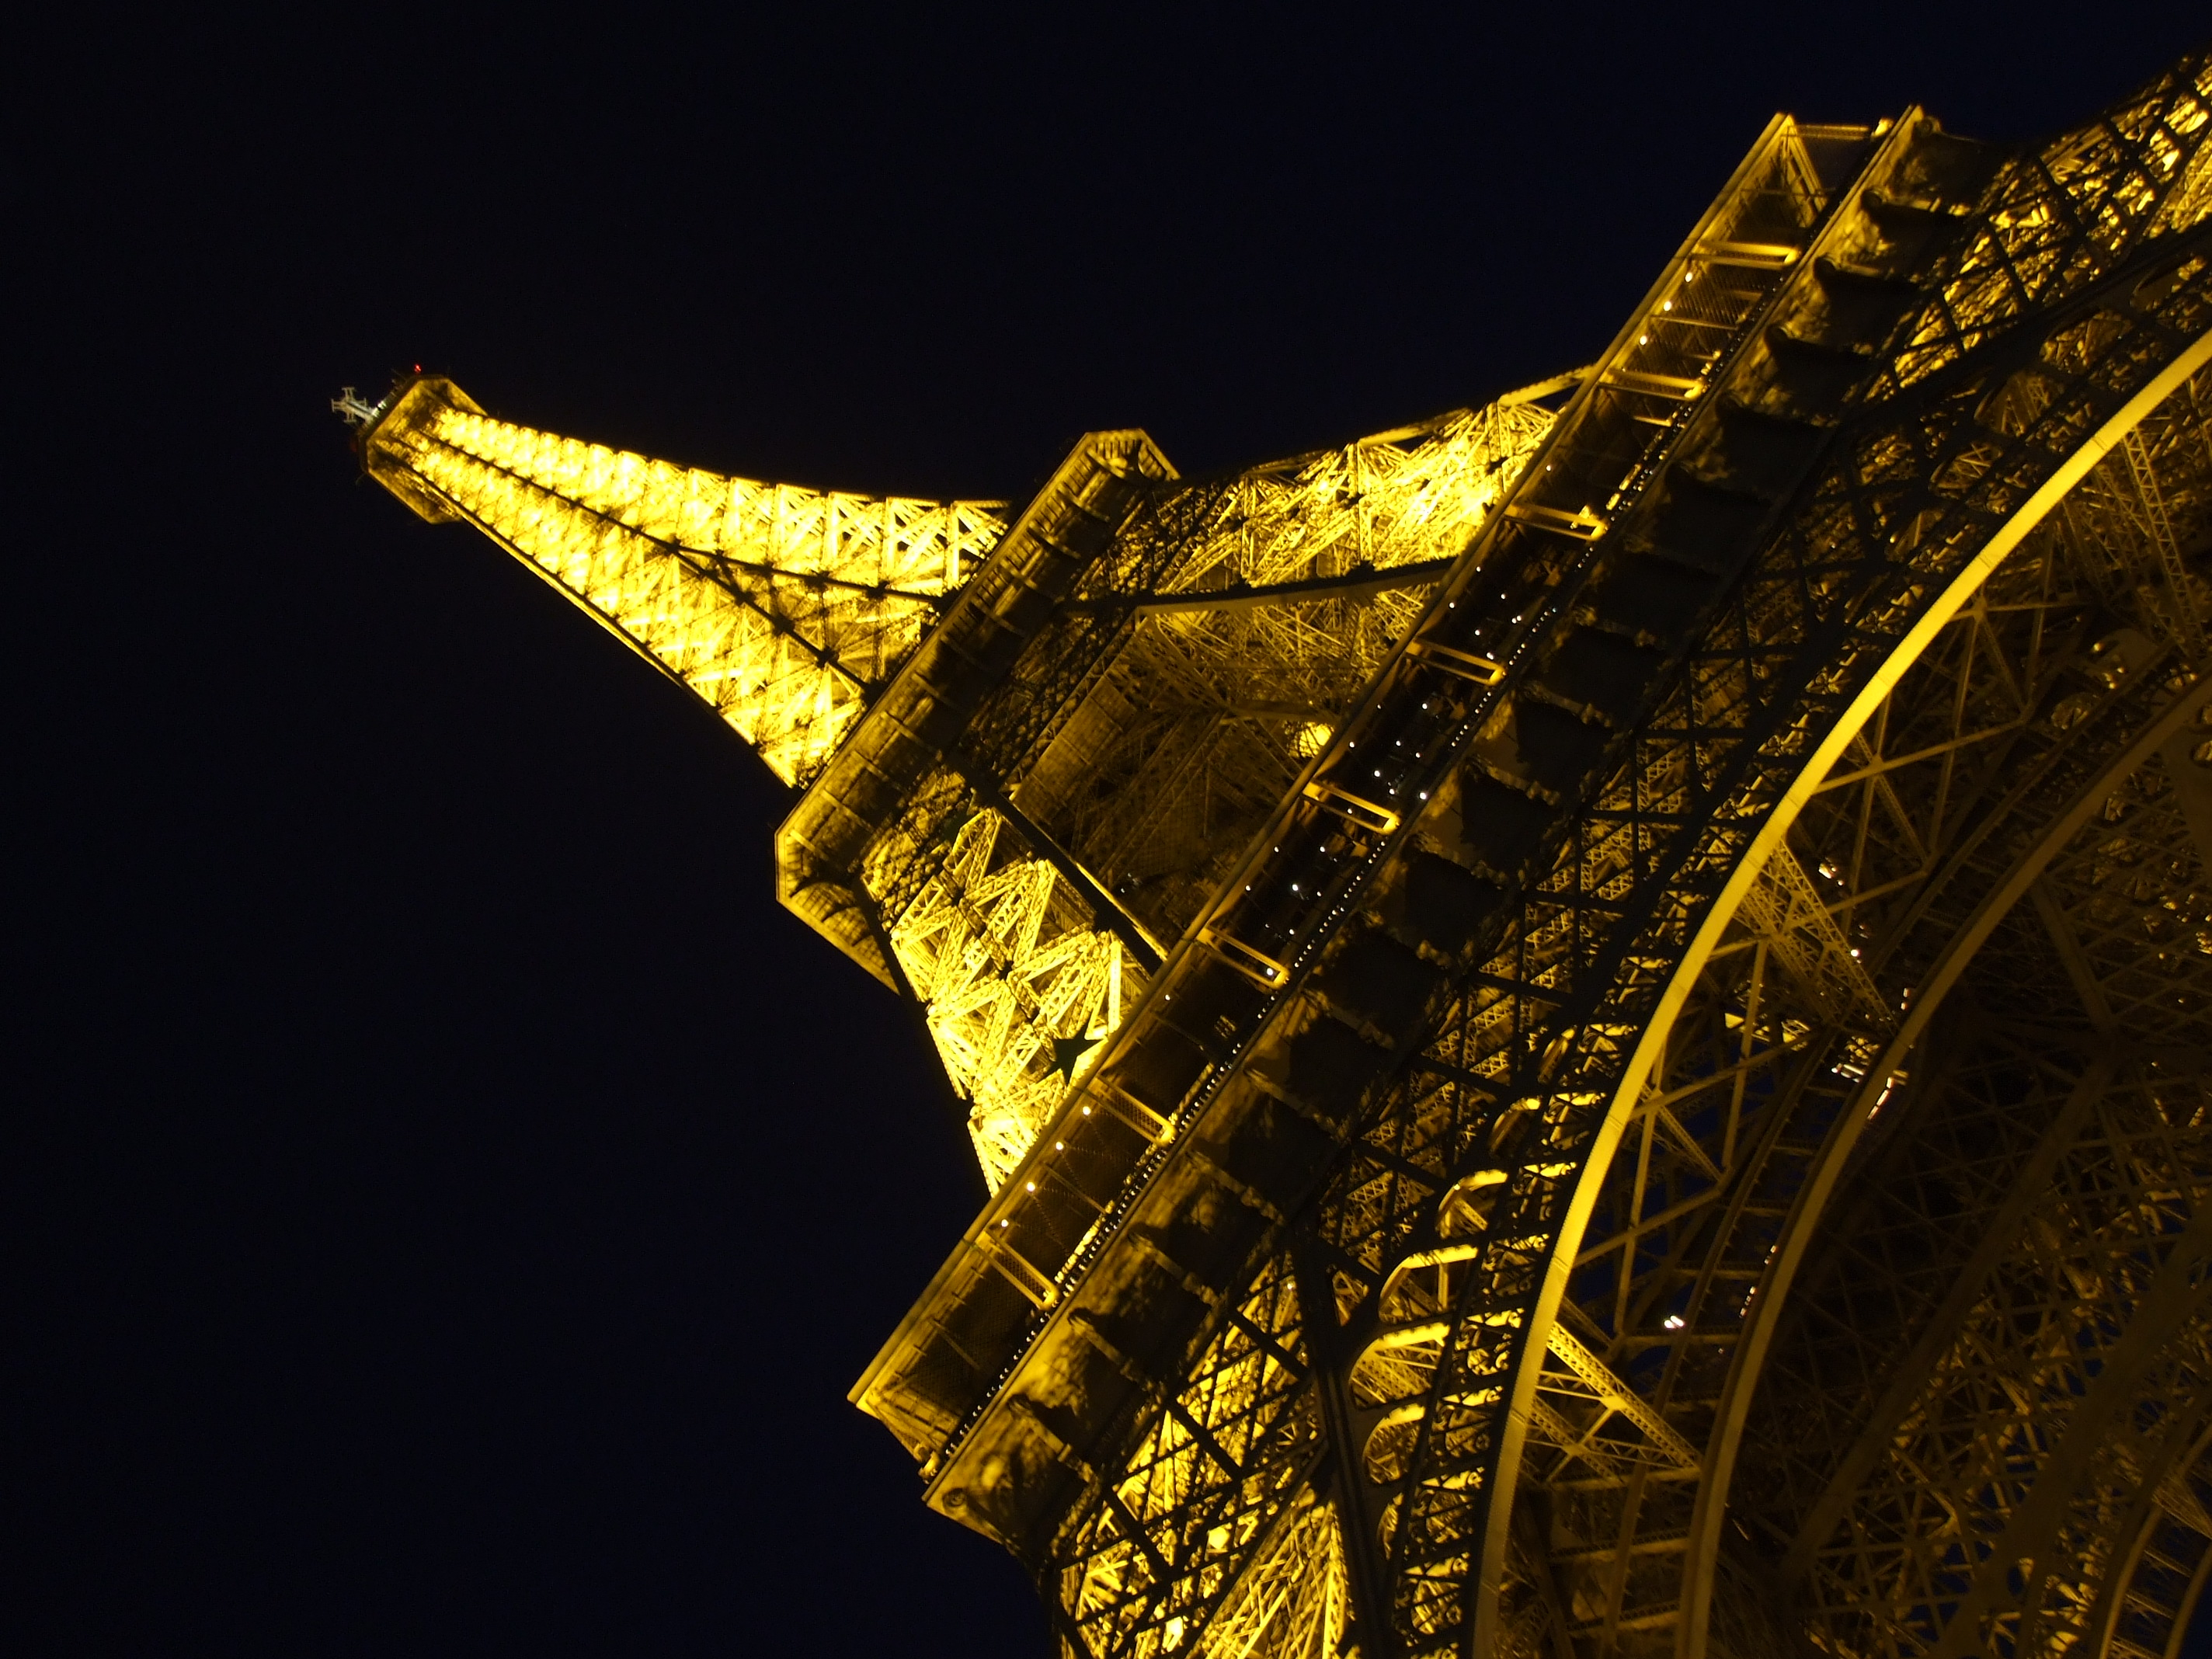 _Eiffel Tower at Night, Paris, France скачать